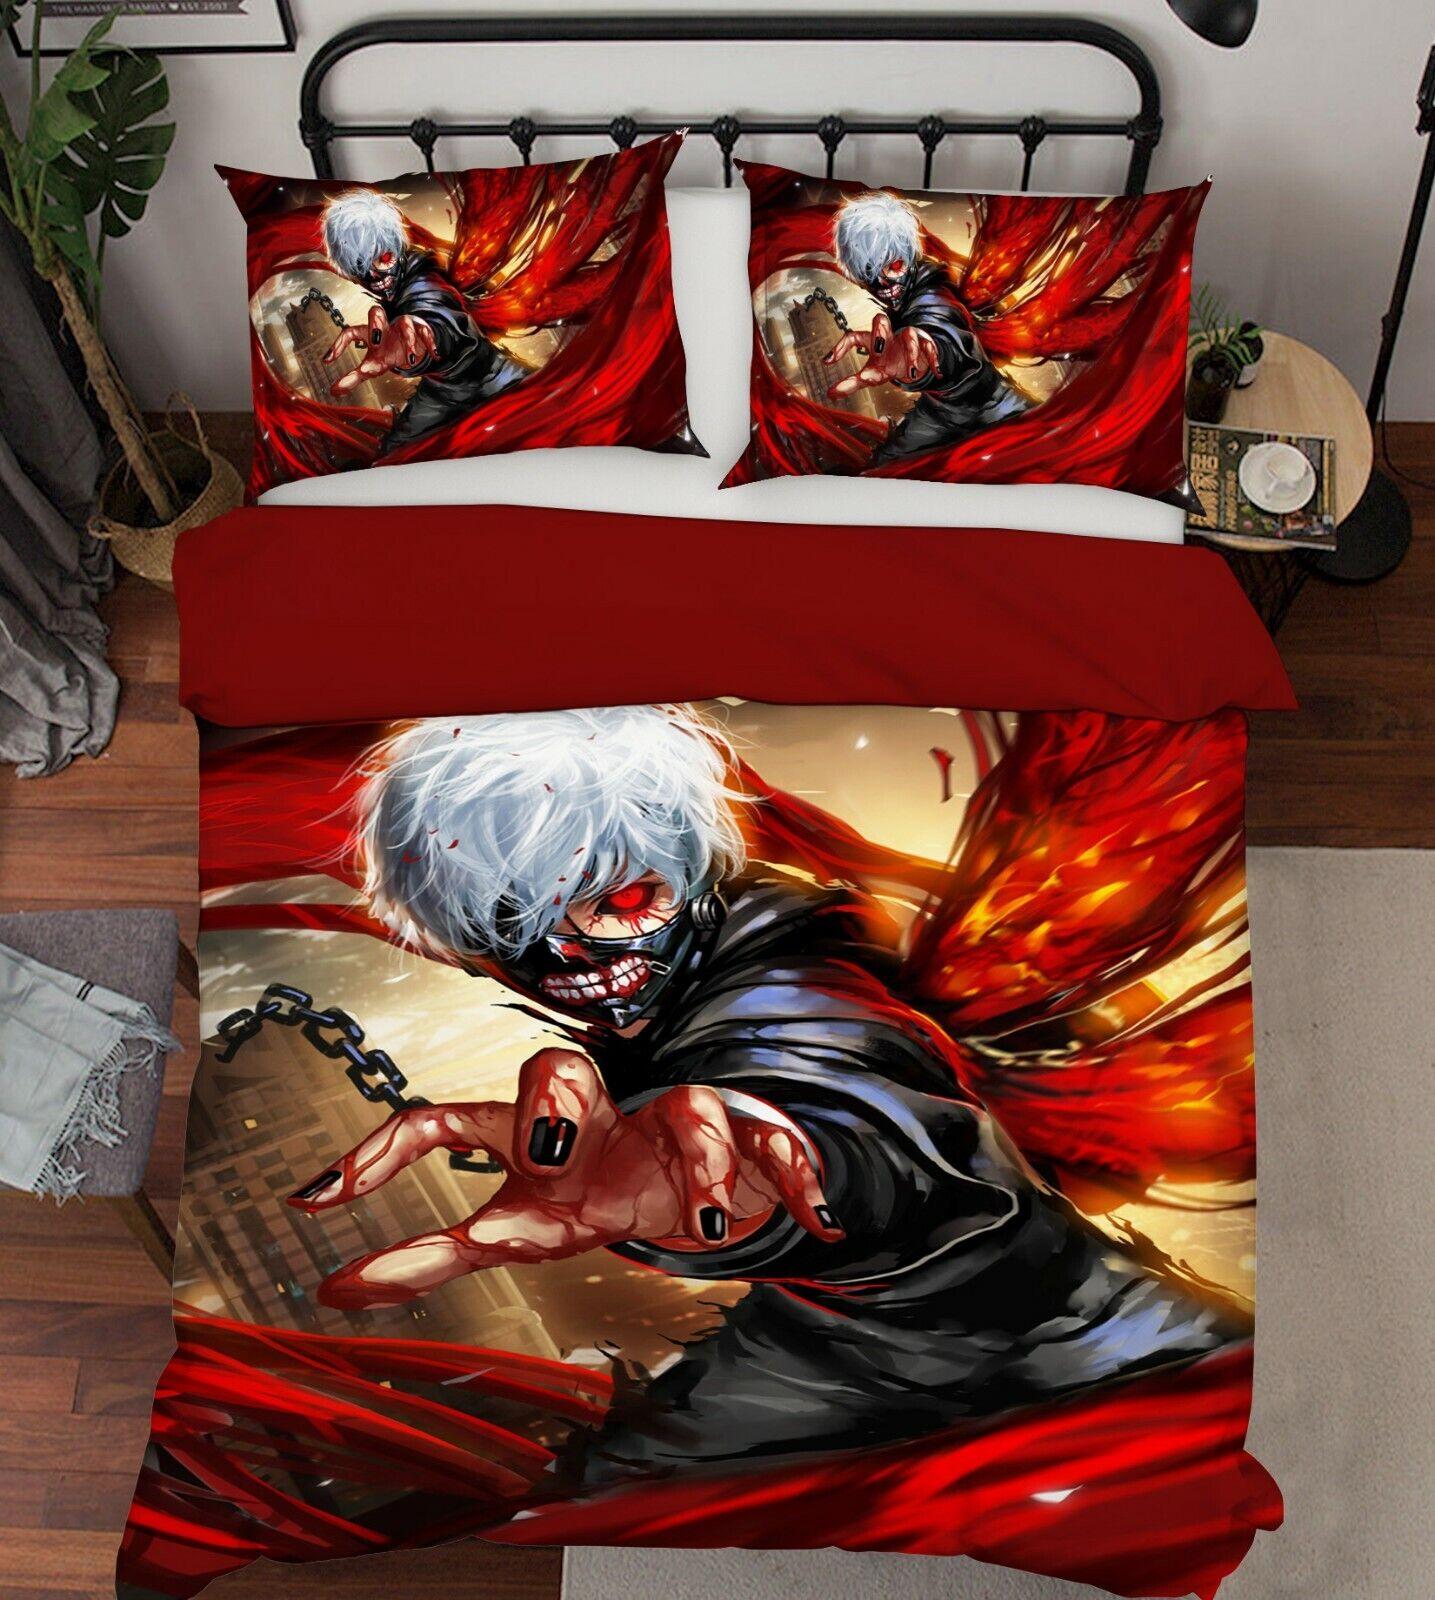 3D Tokyo Ghoul 870 Japan Anime Bed Pillowcases Quilt Duvet Cover Set Single